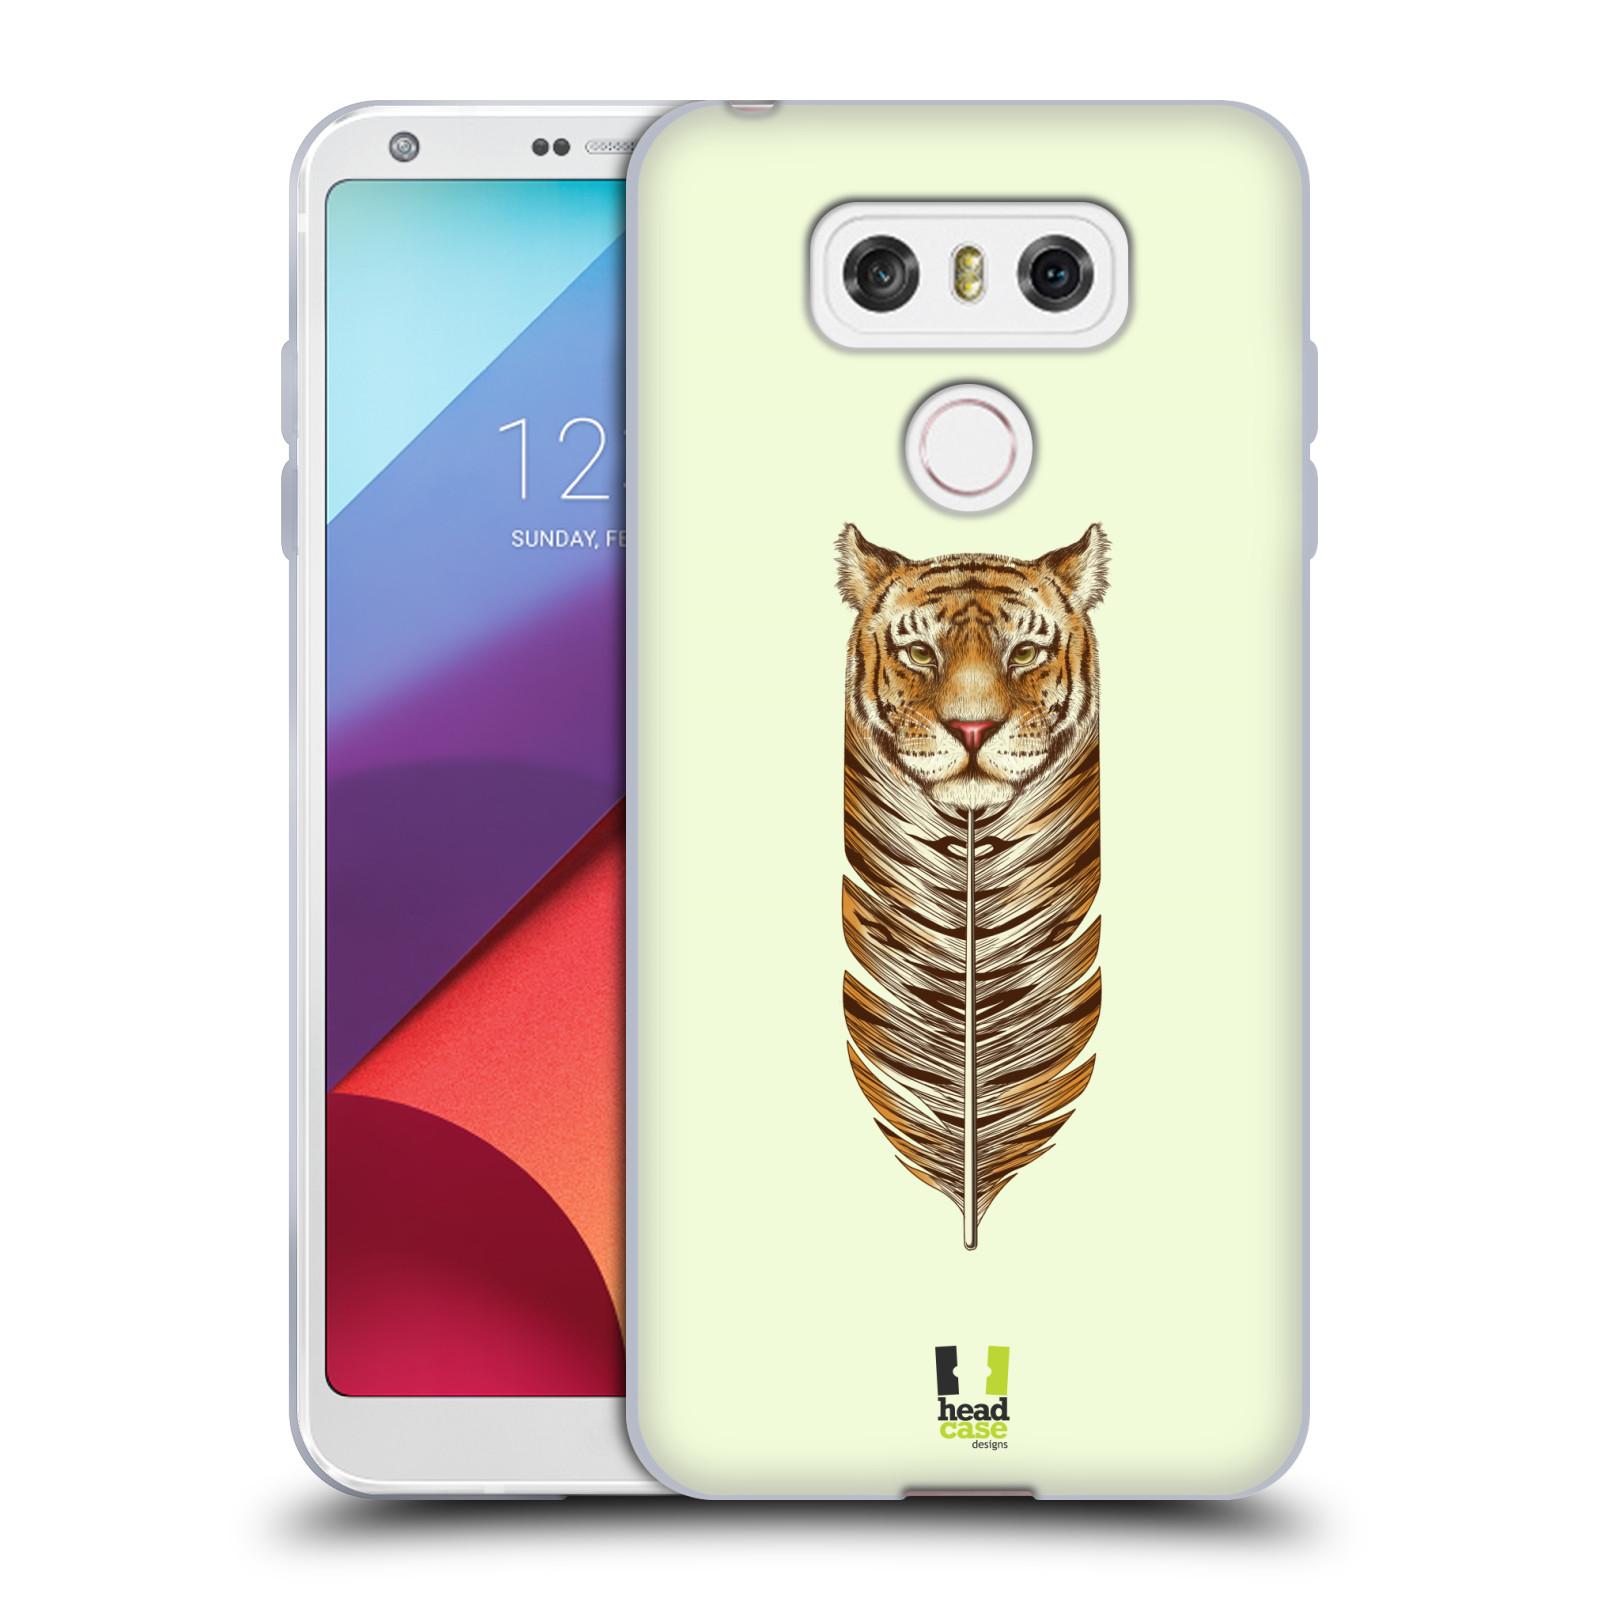 Silikonové pouzdro na mobil LG G6 - Head Case PÍRKO TYGR (Silikonový kryt či obal na mobilní telefon LG G6 H870 / LG G6 Dual SIM H870DS)